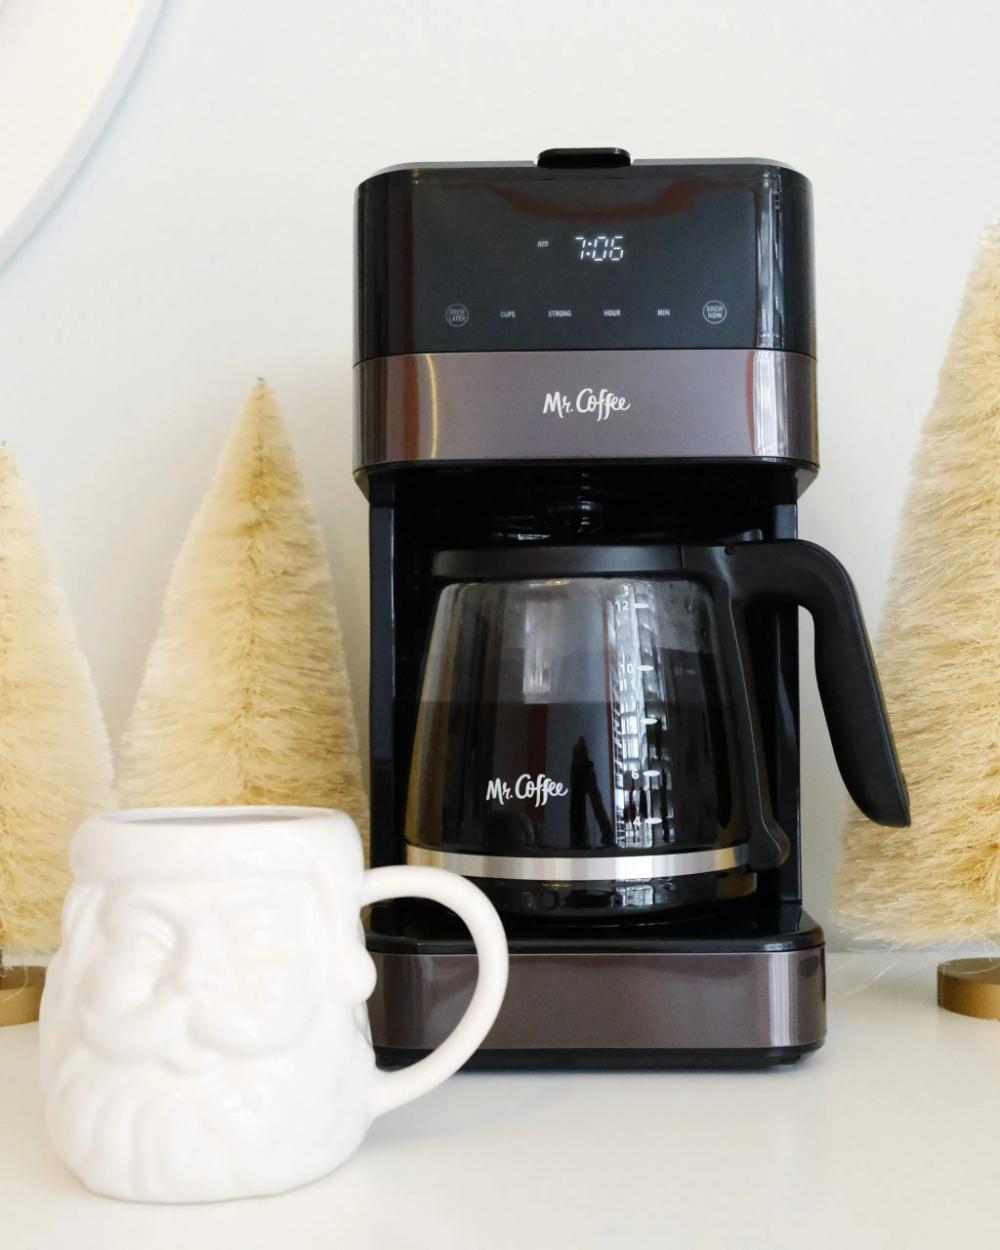 Mr Coffee Touch Coffeemaker Walmart Finds Coffee Maker Mr Coffee Walmart Finds